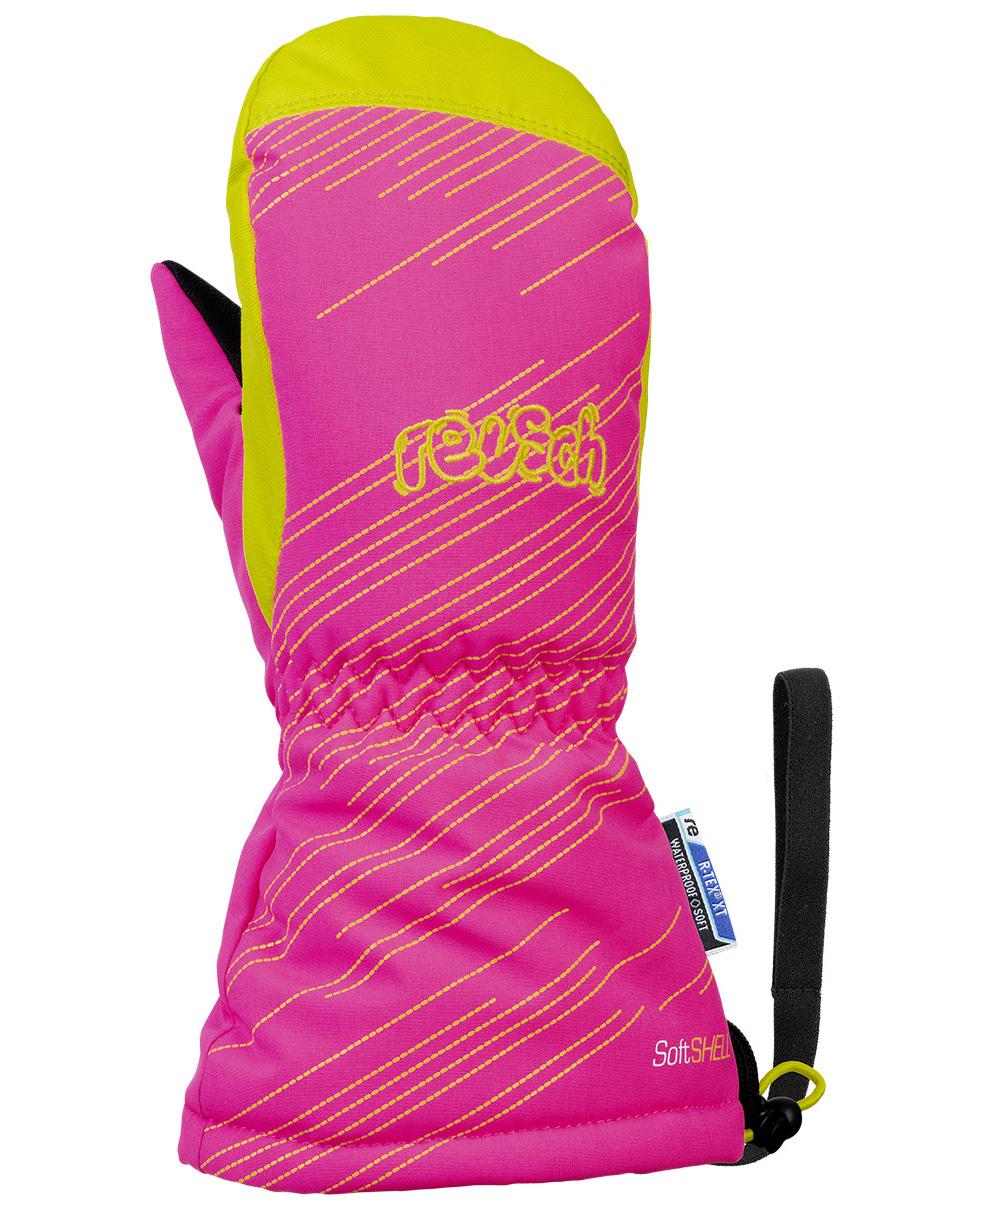 Варежки Reusch 2020-21 Maxi R-Tex® Xt Mitten Knockout Pink/Lime (Inch (Дюйм):I)